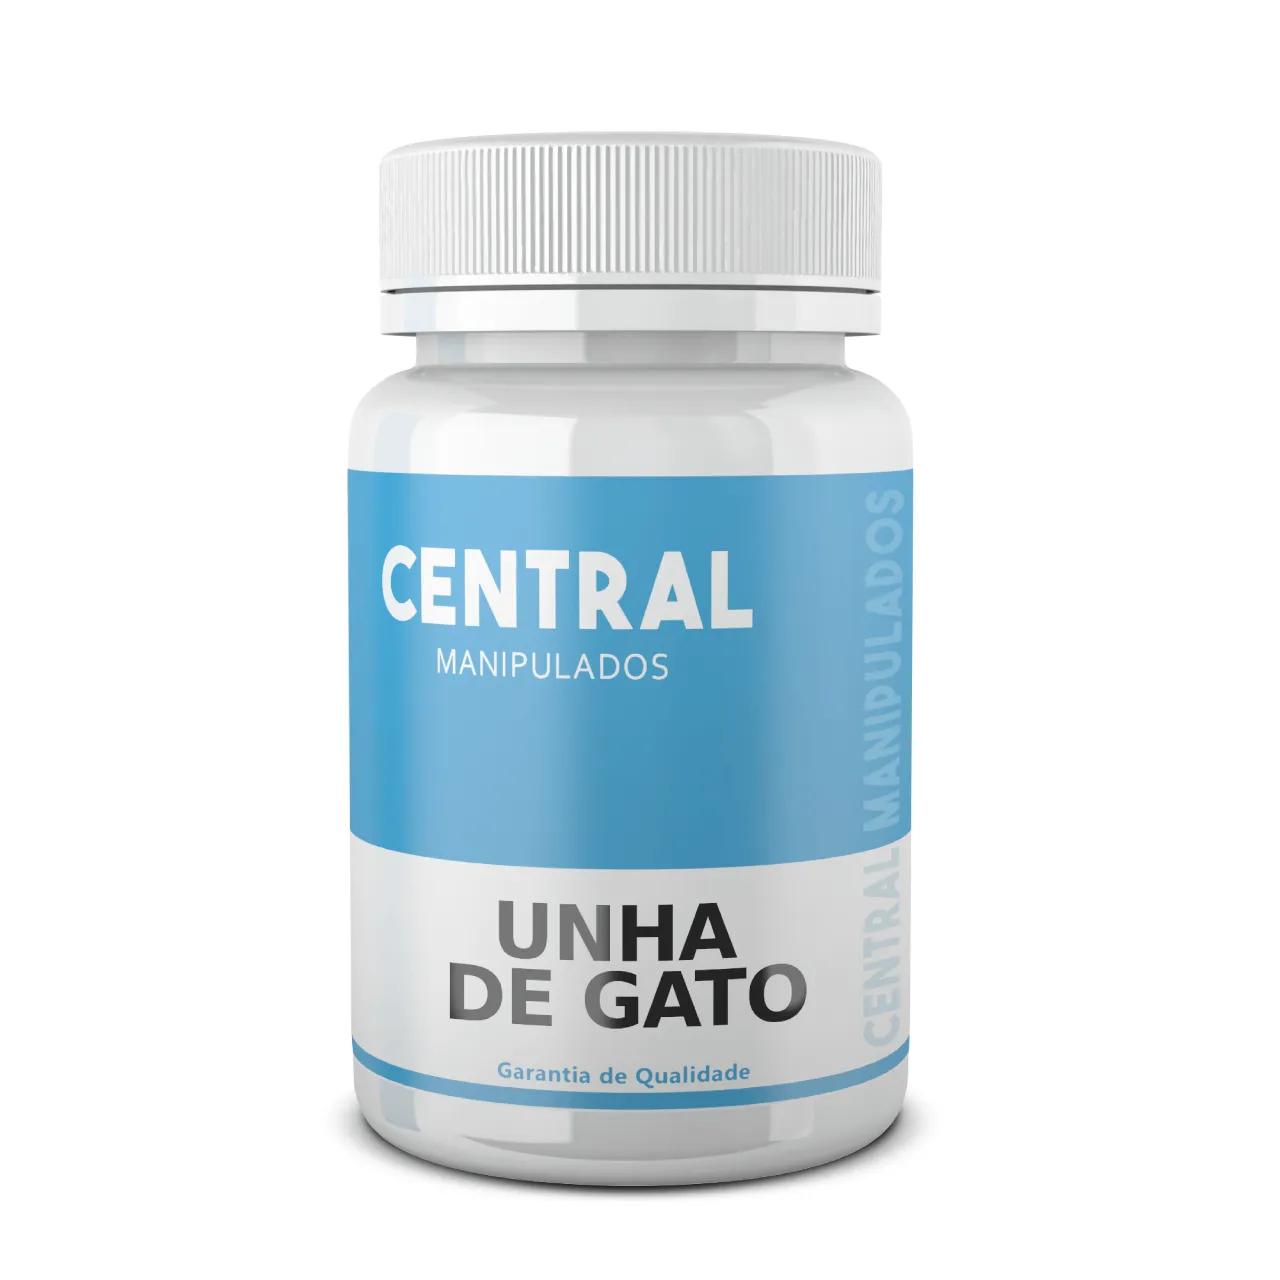 Unha de Gato 500mg - 30 Cápsulas - Reduz a dor da Artrite, Gota, Osteoporose, Reumatismo. Aumenta Imunidade.